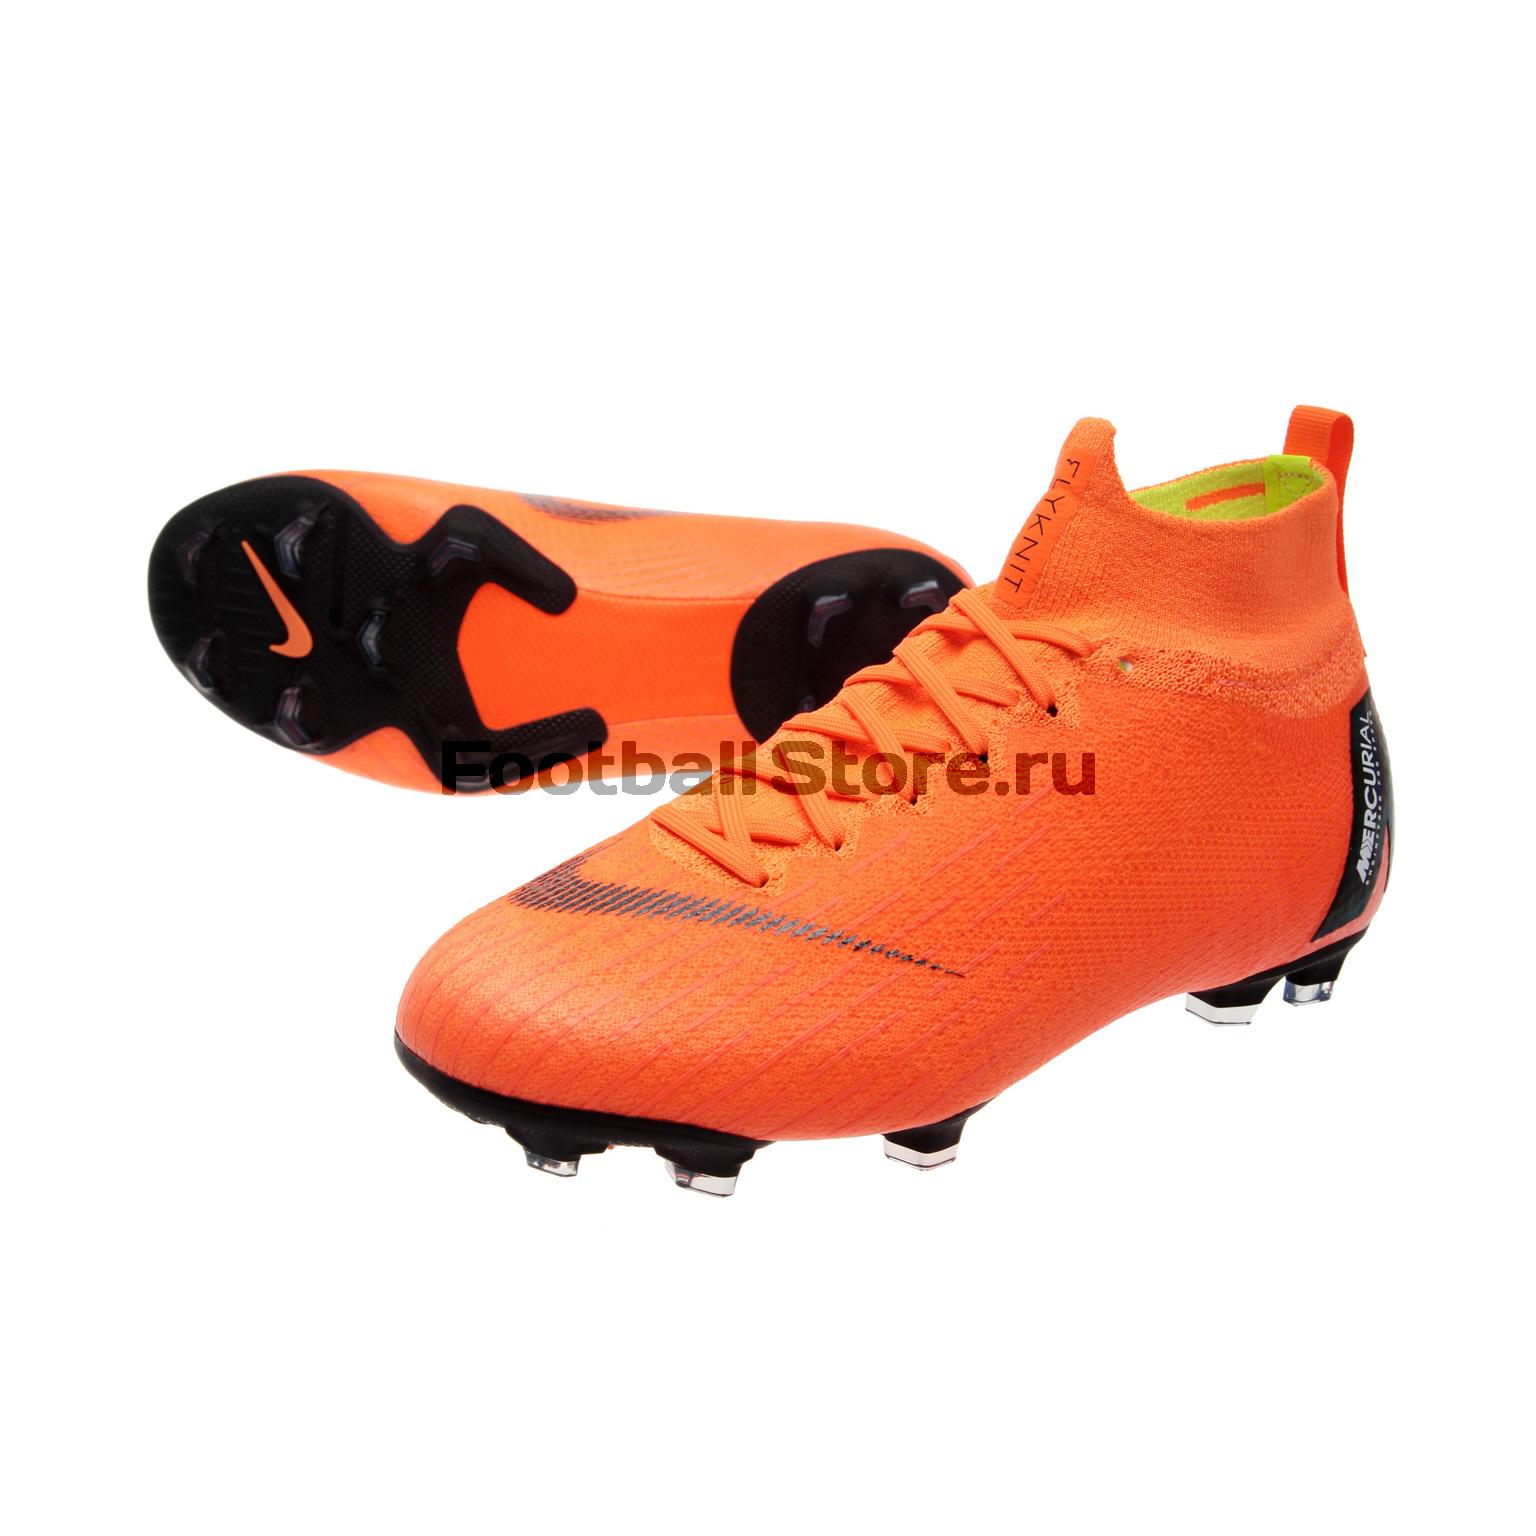 b85cc46c Бутсы Nike JR Superfly 6 Elite FG AH7340-810 – купить в интернет ...